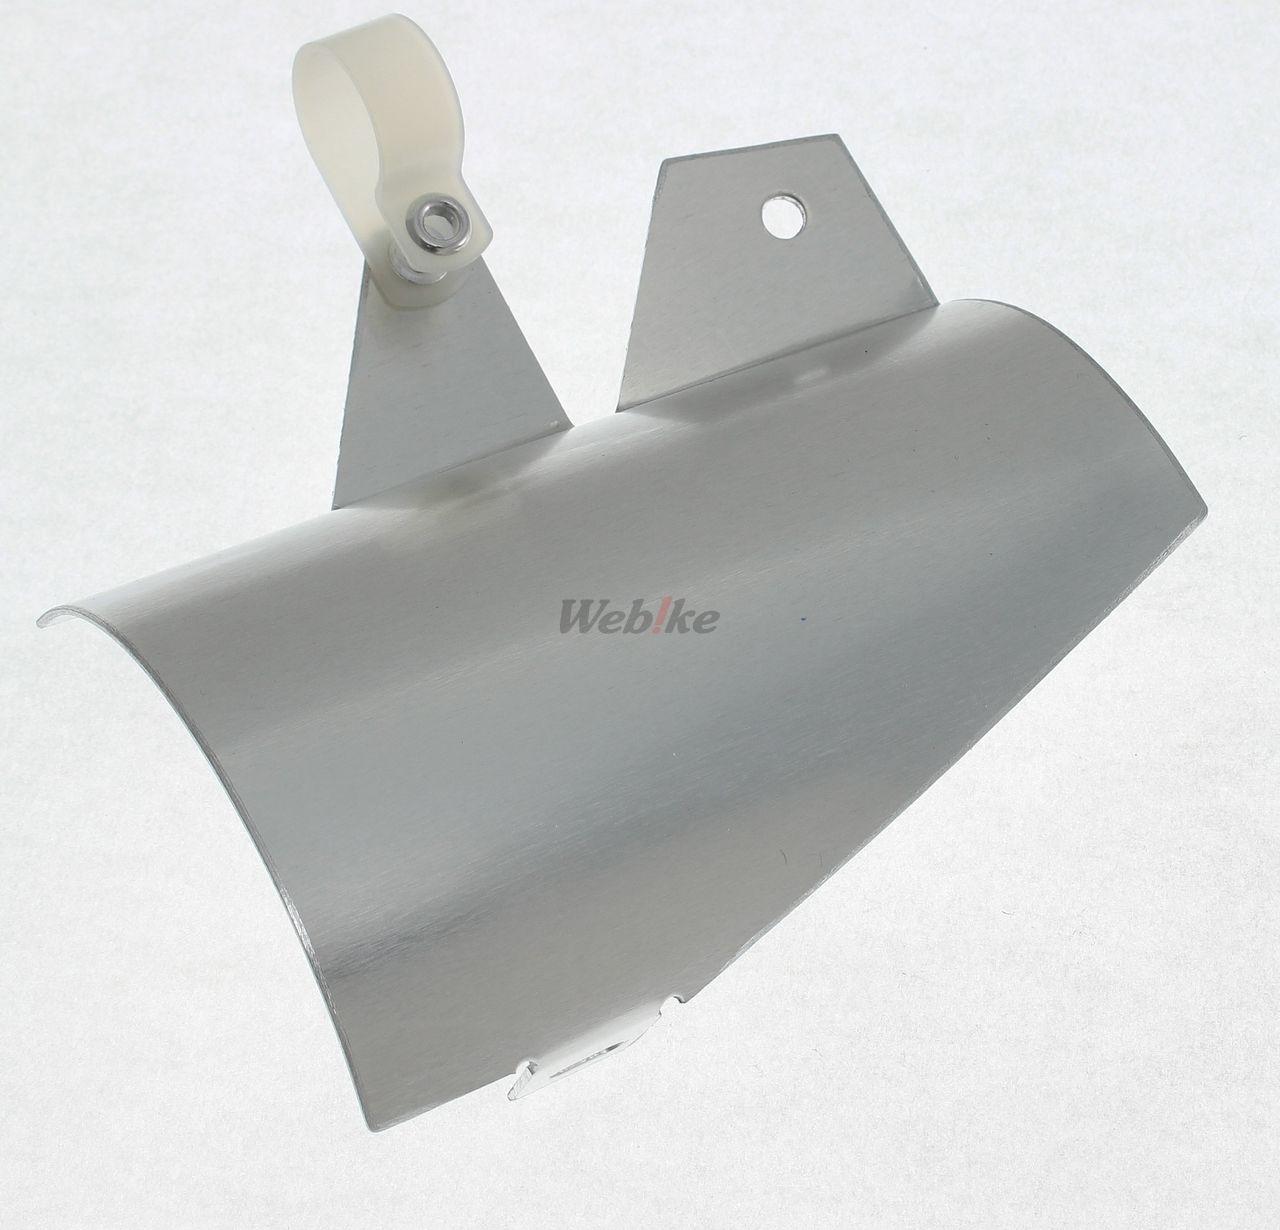 【KIJIMA】鋁合金擋泥板 - 「Webike-摩托百貨」